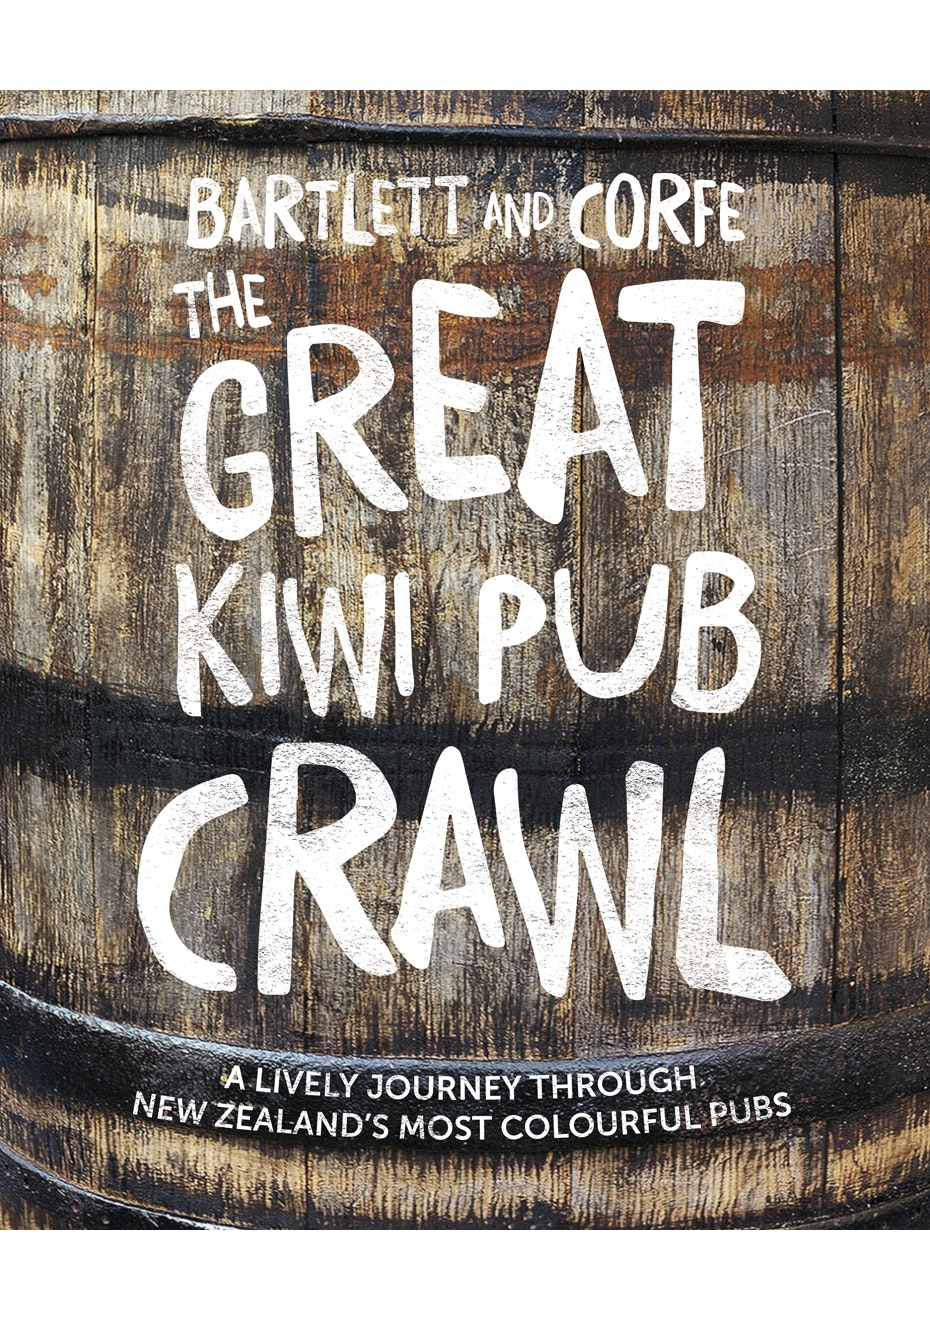 The Great Kiwi Pub Crawl